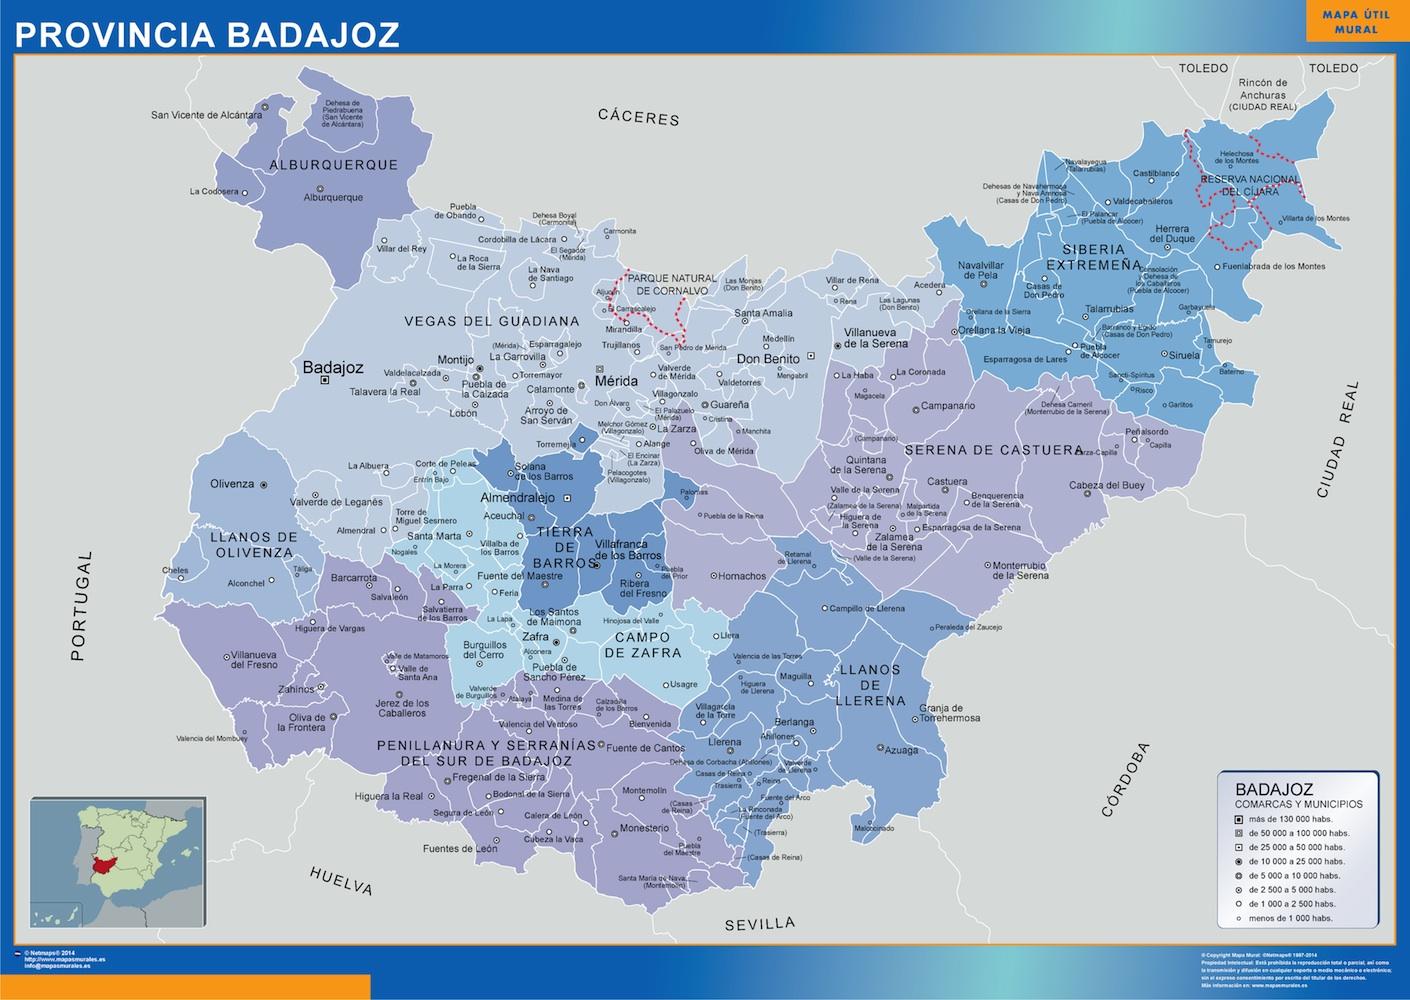 Mapa municipios provincia Badajoz